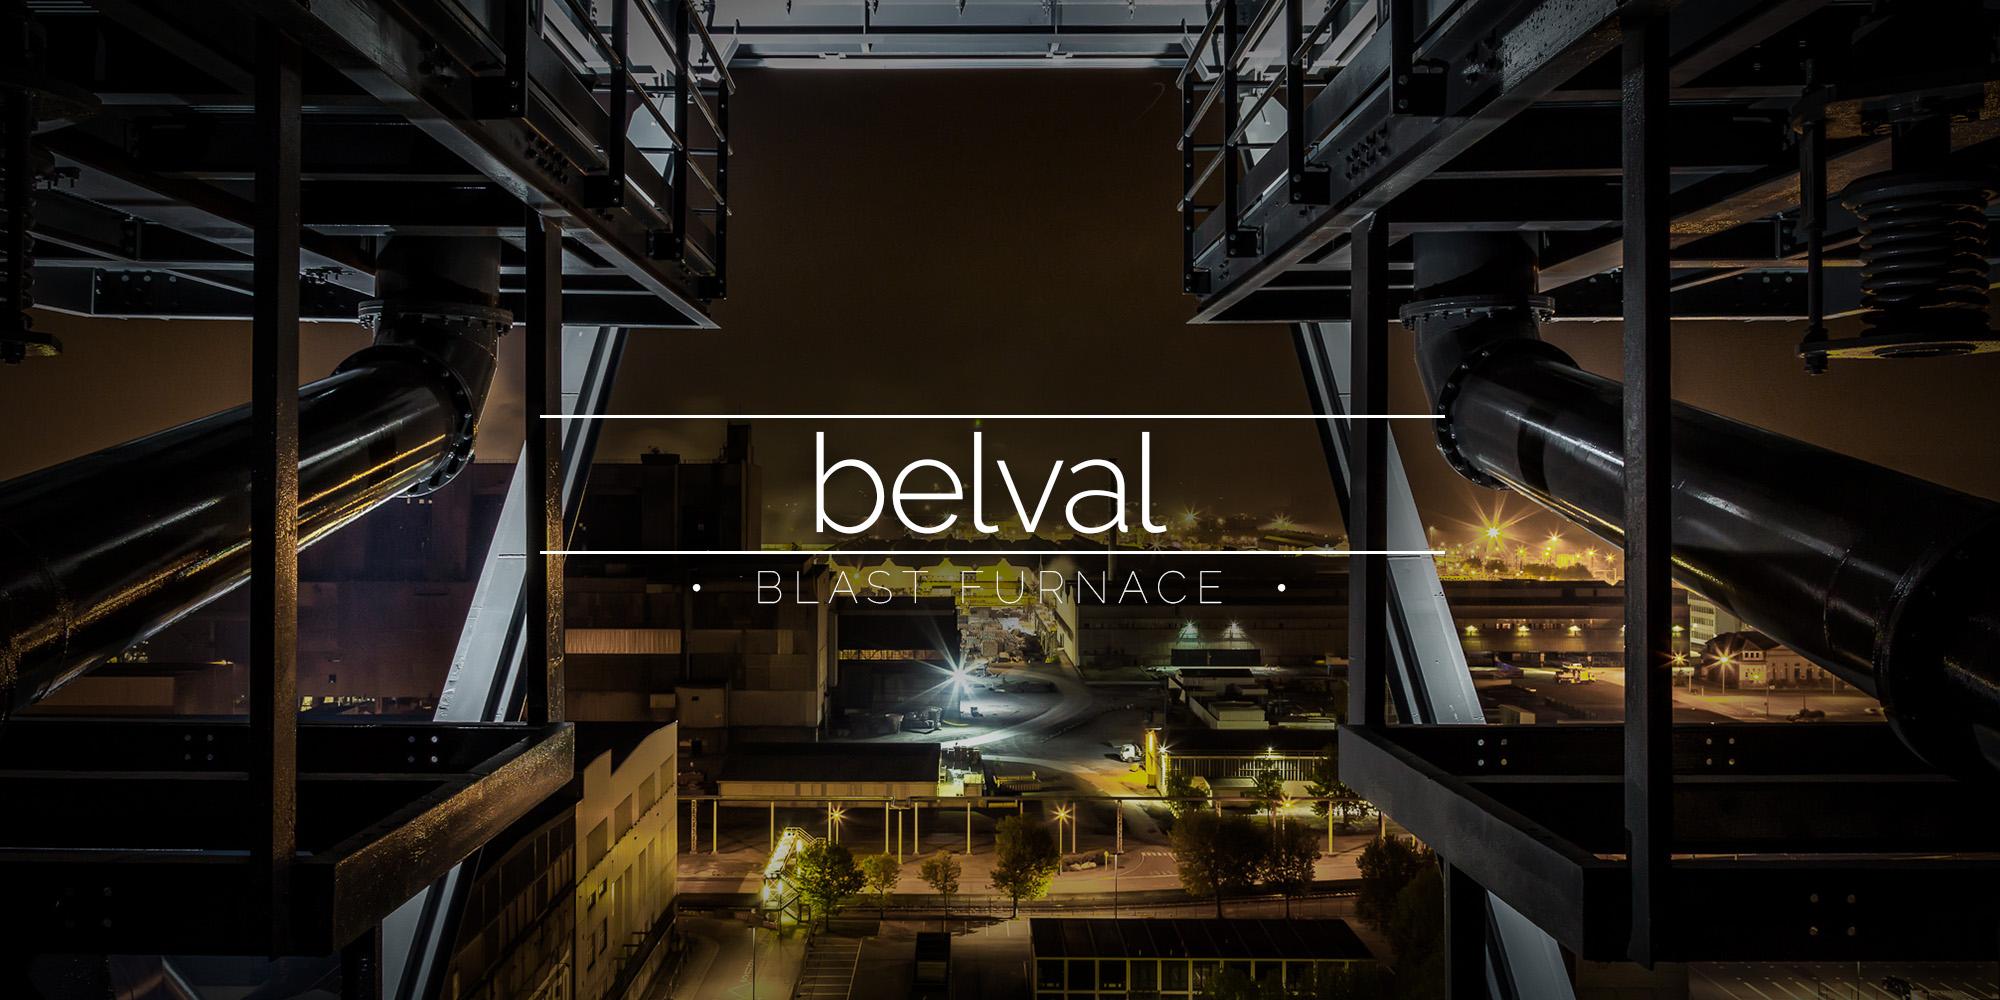 Belval Luxembourg Blast Furnace Night Climb